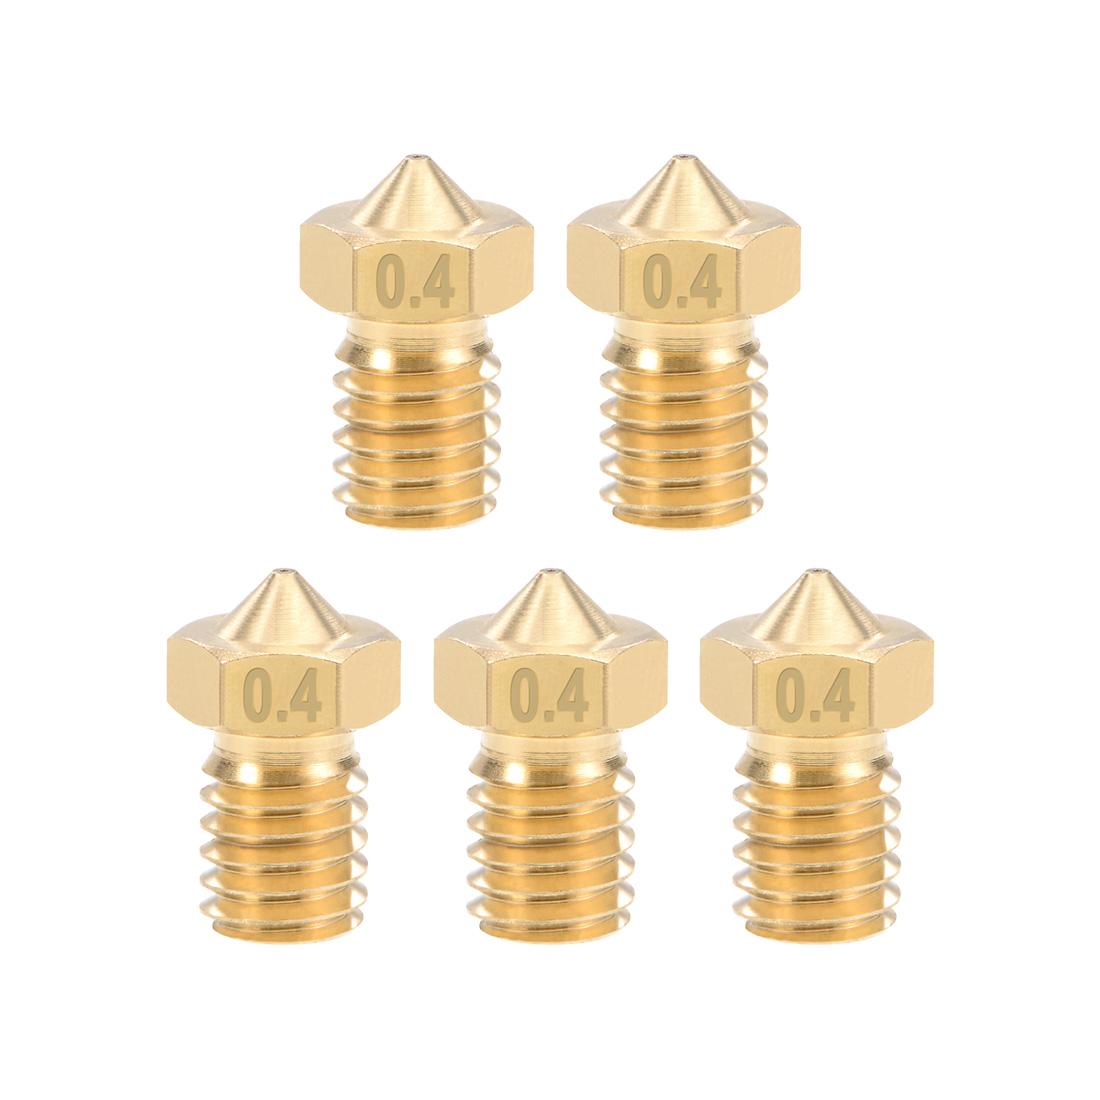 0.4mm 3D Printer Nozzle Head M6 Thread V5 V6 1.75mm Extruder Print Brass 5pcs